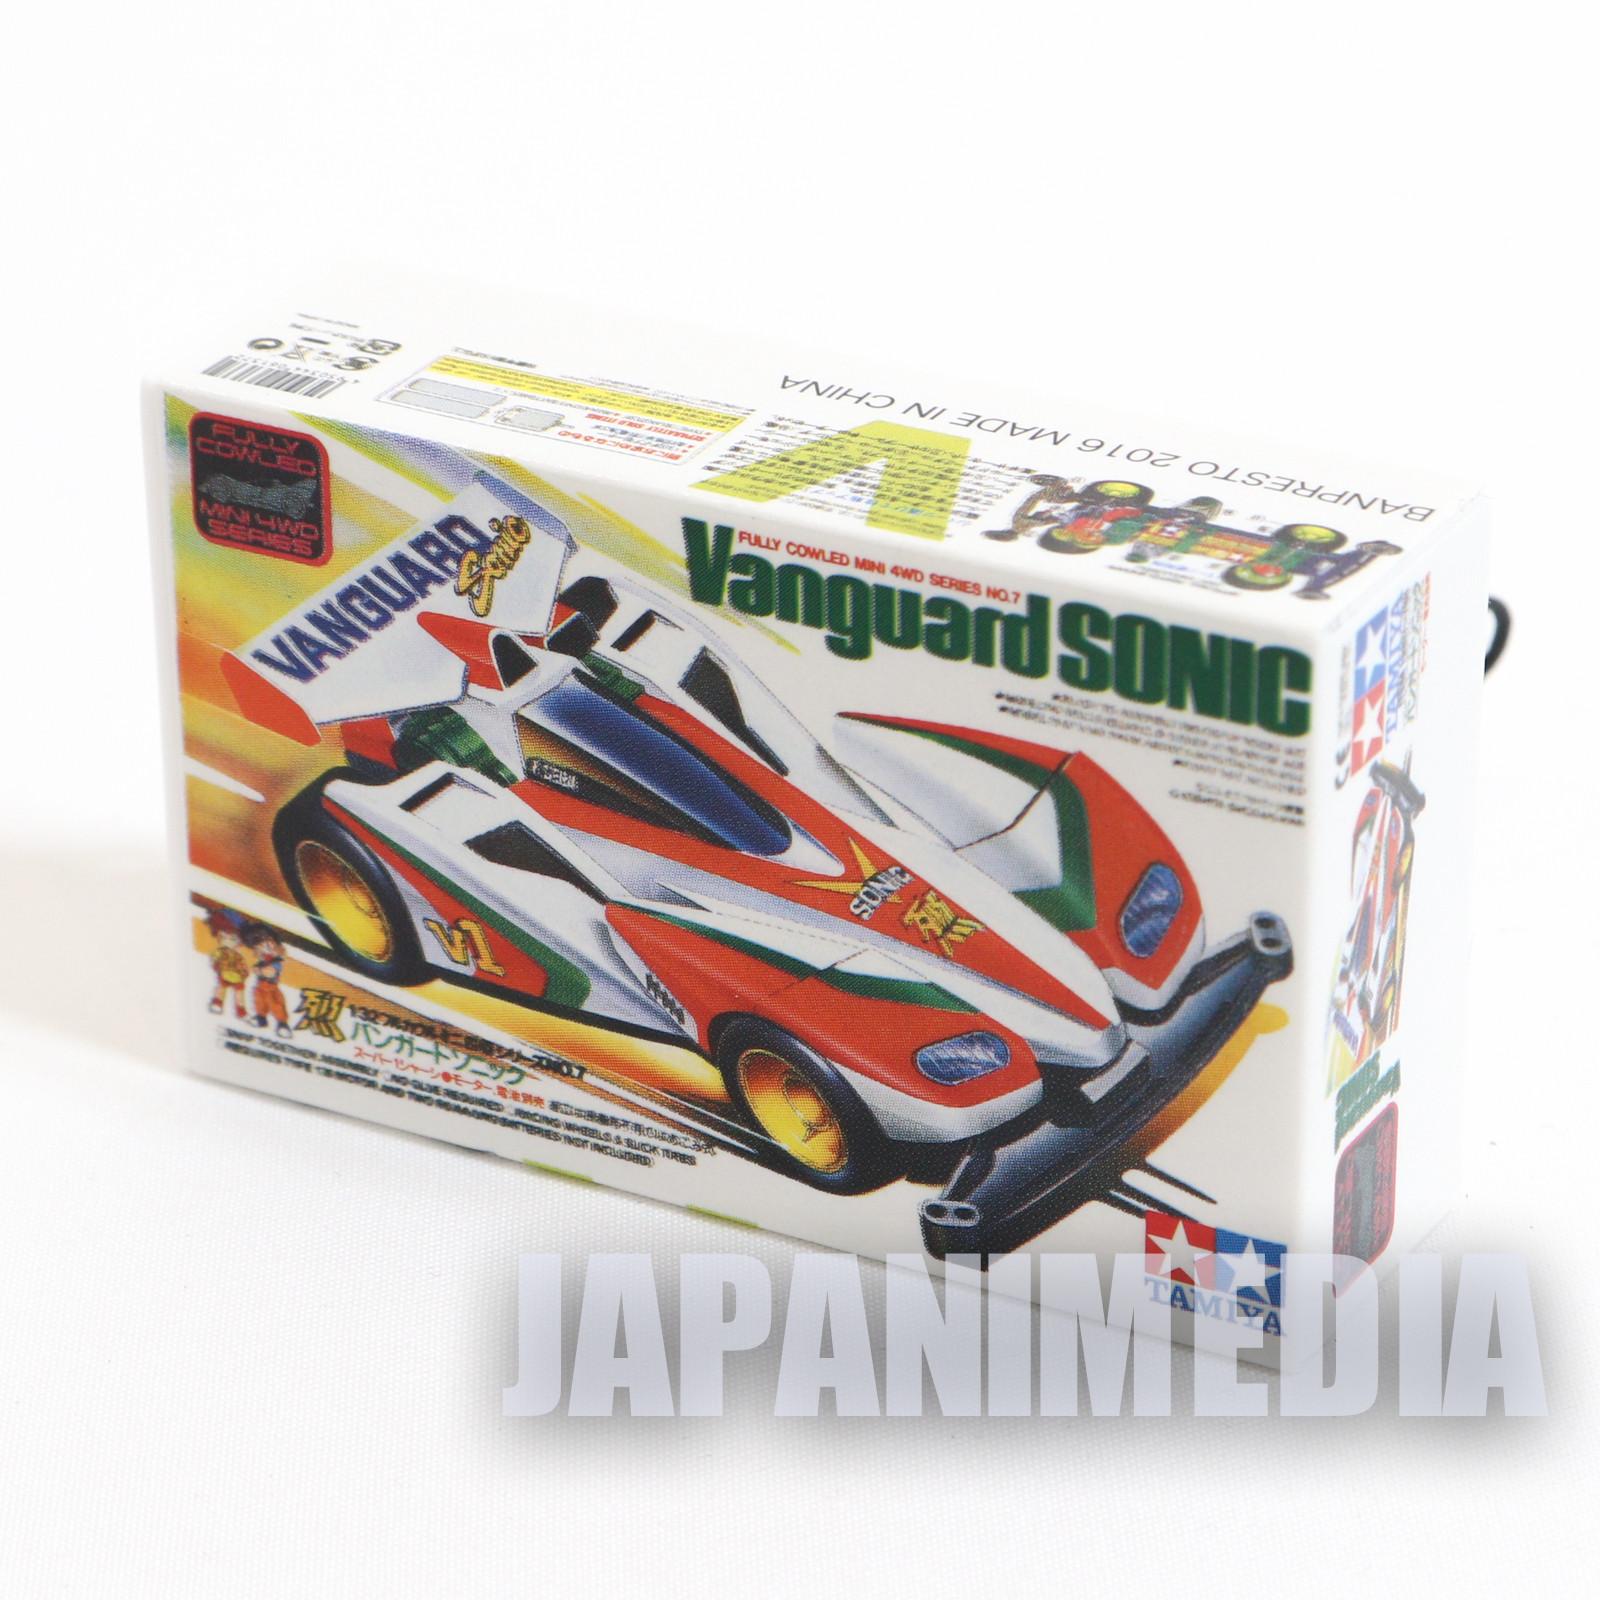 Bakusou Kyoudai Let's & Go!! Small Case Strap Mini 4WD Vanguard SONIC TAMIYA